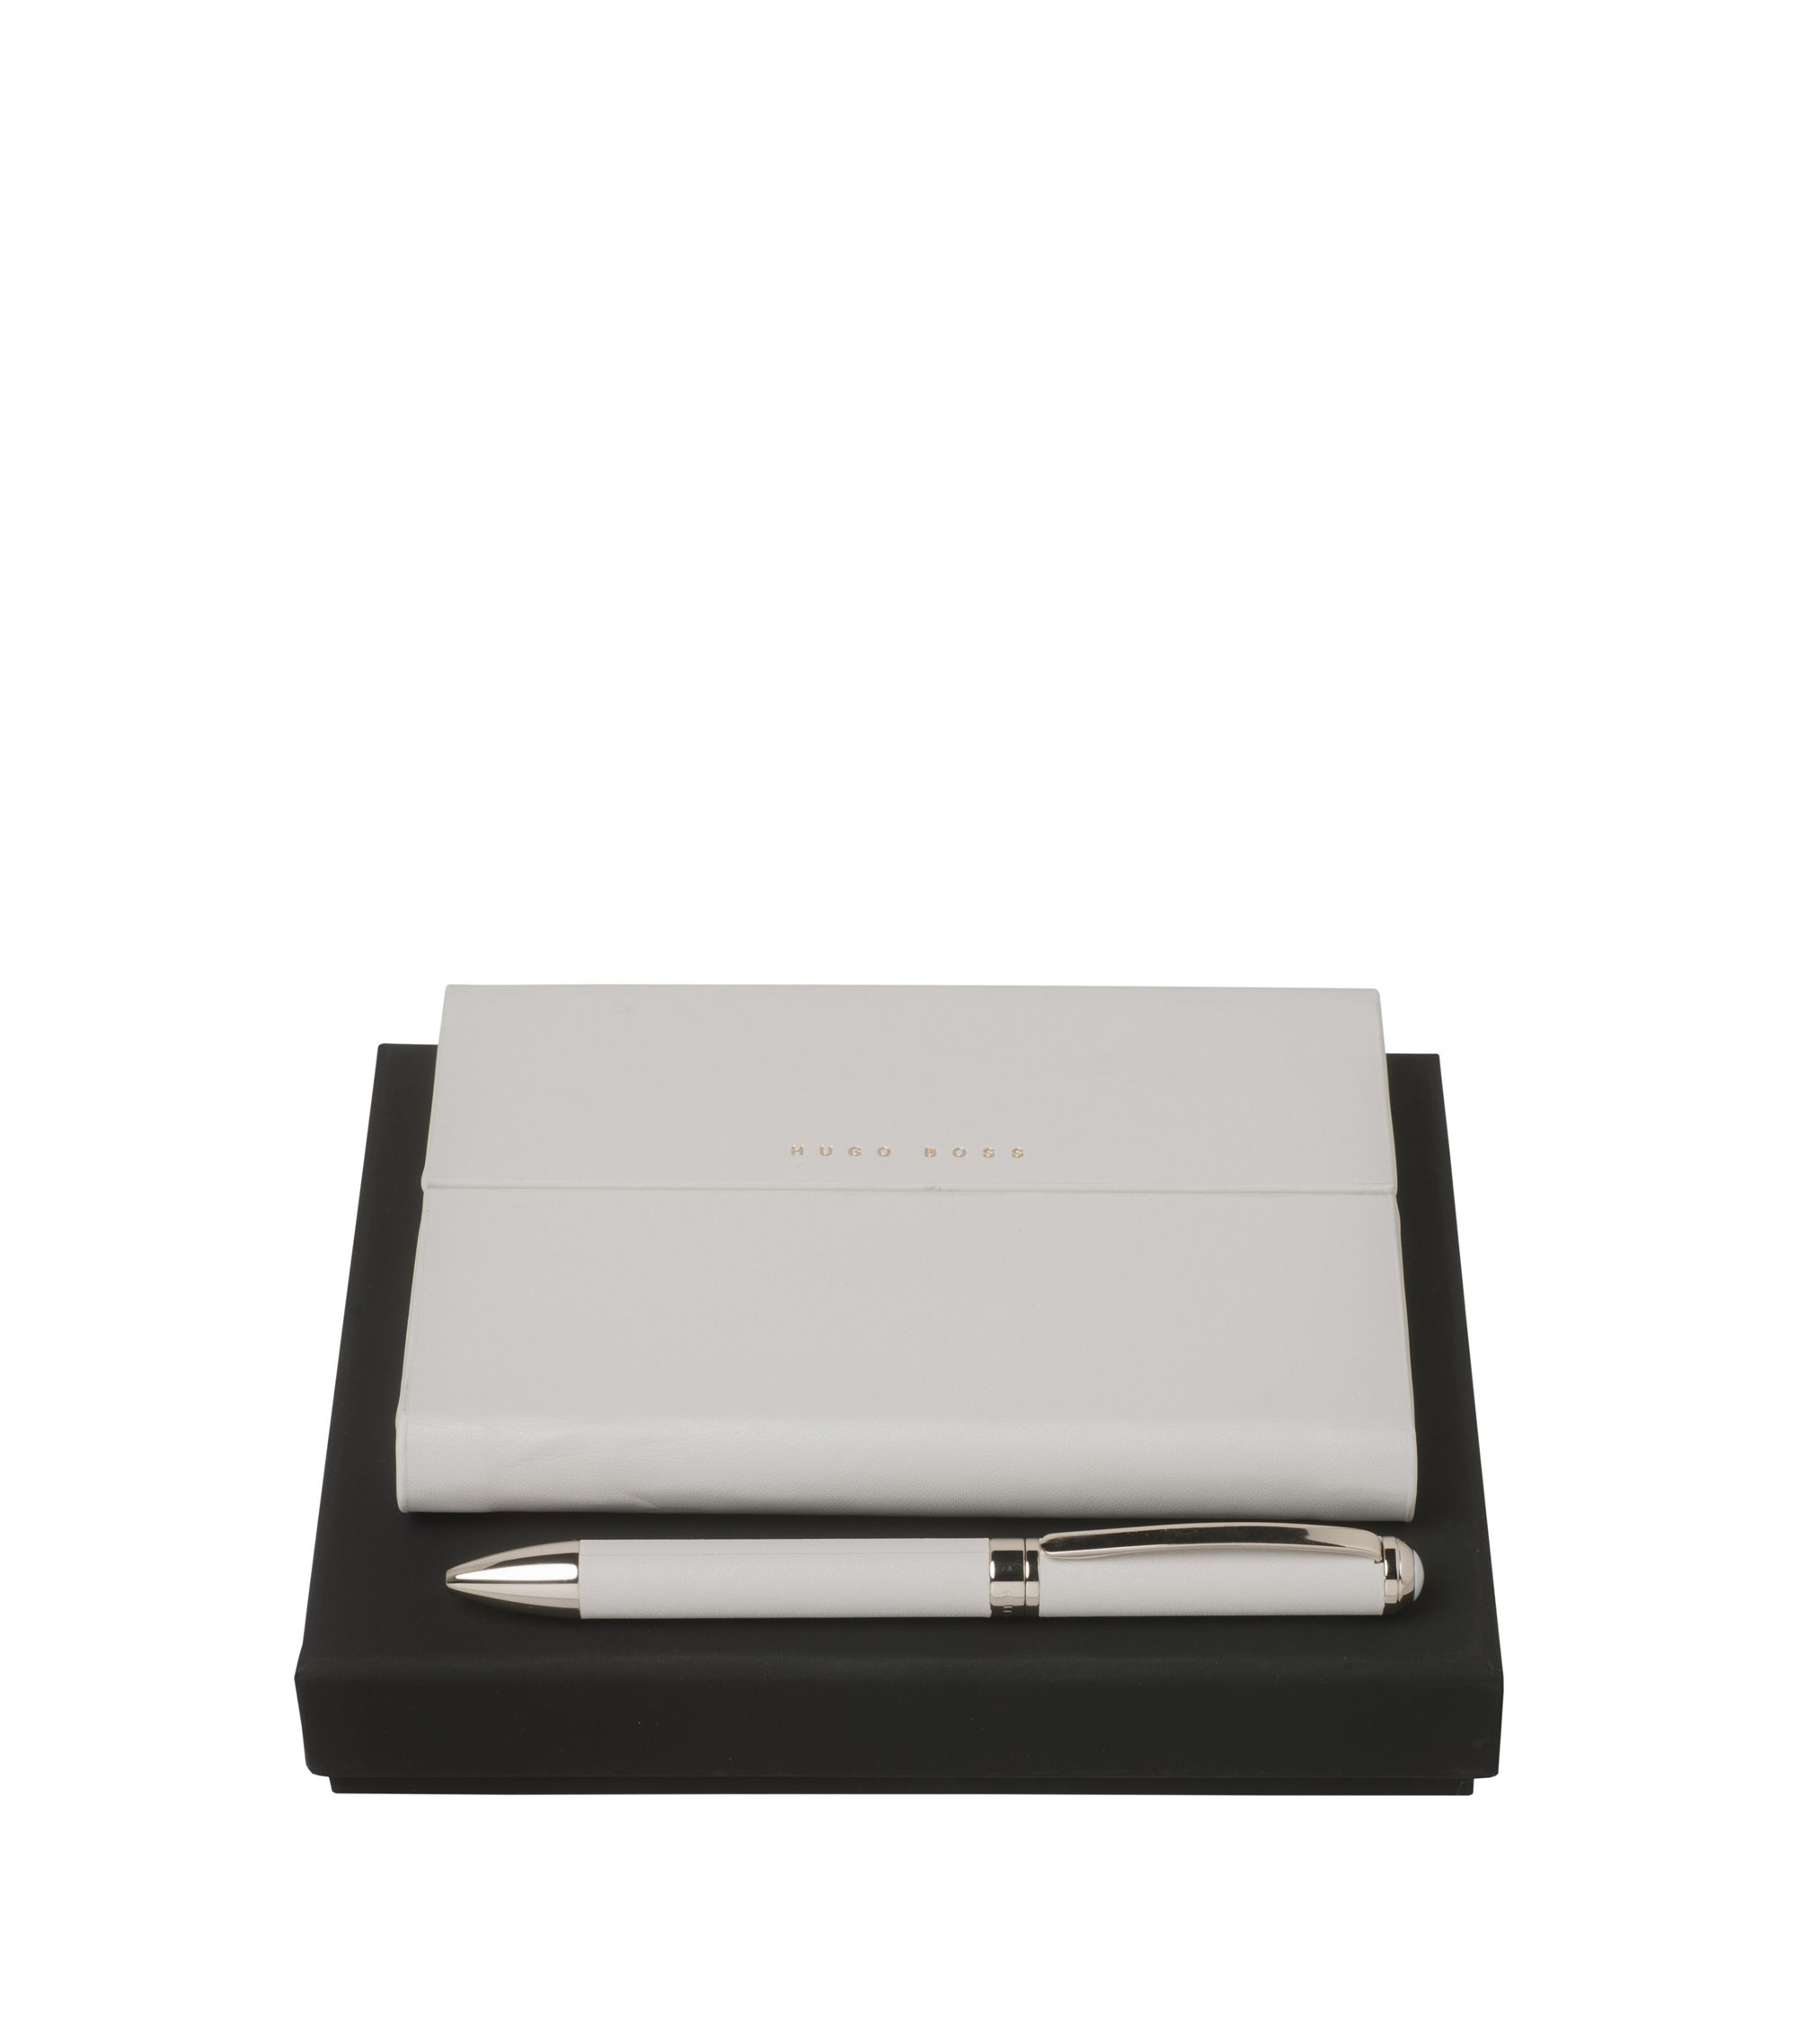 Verse Ballpoint Pen & Notebook Set | HPBM606K, Grey